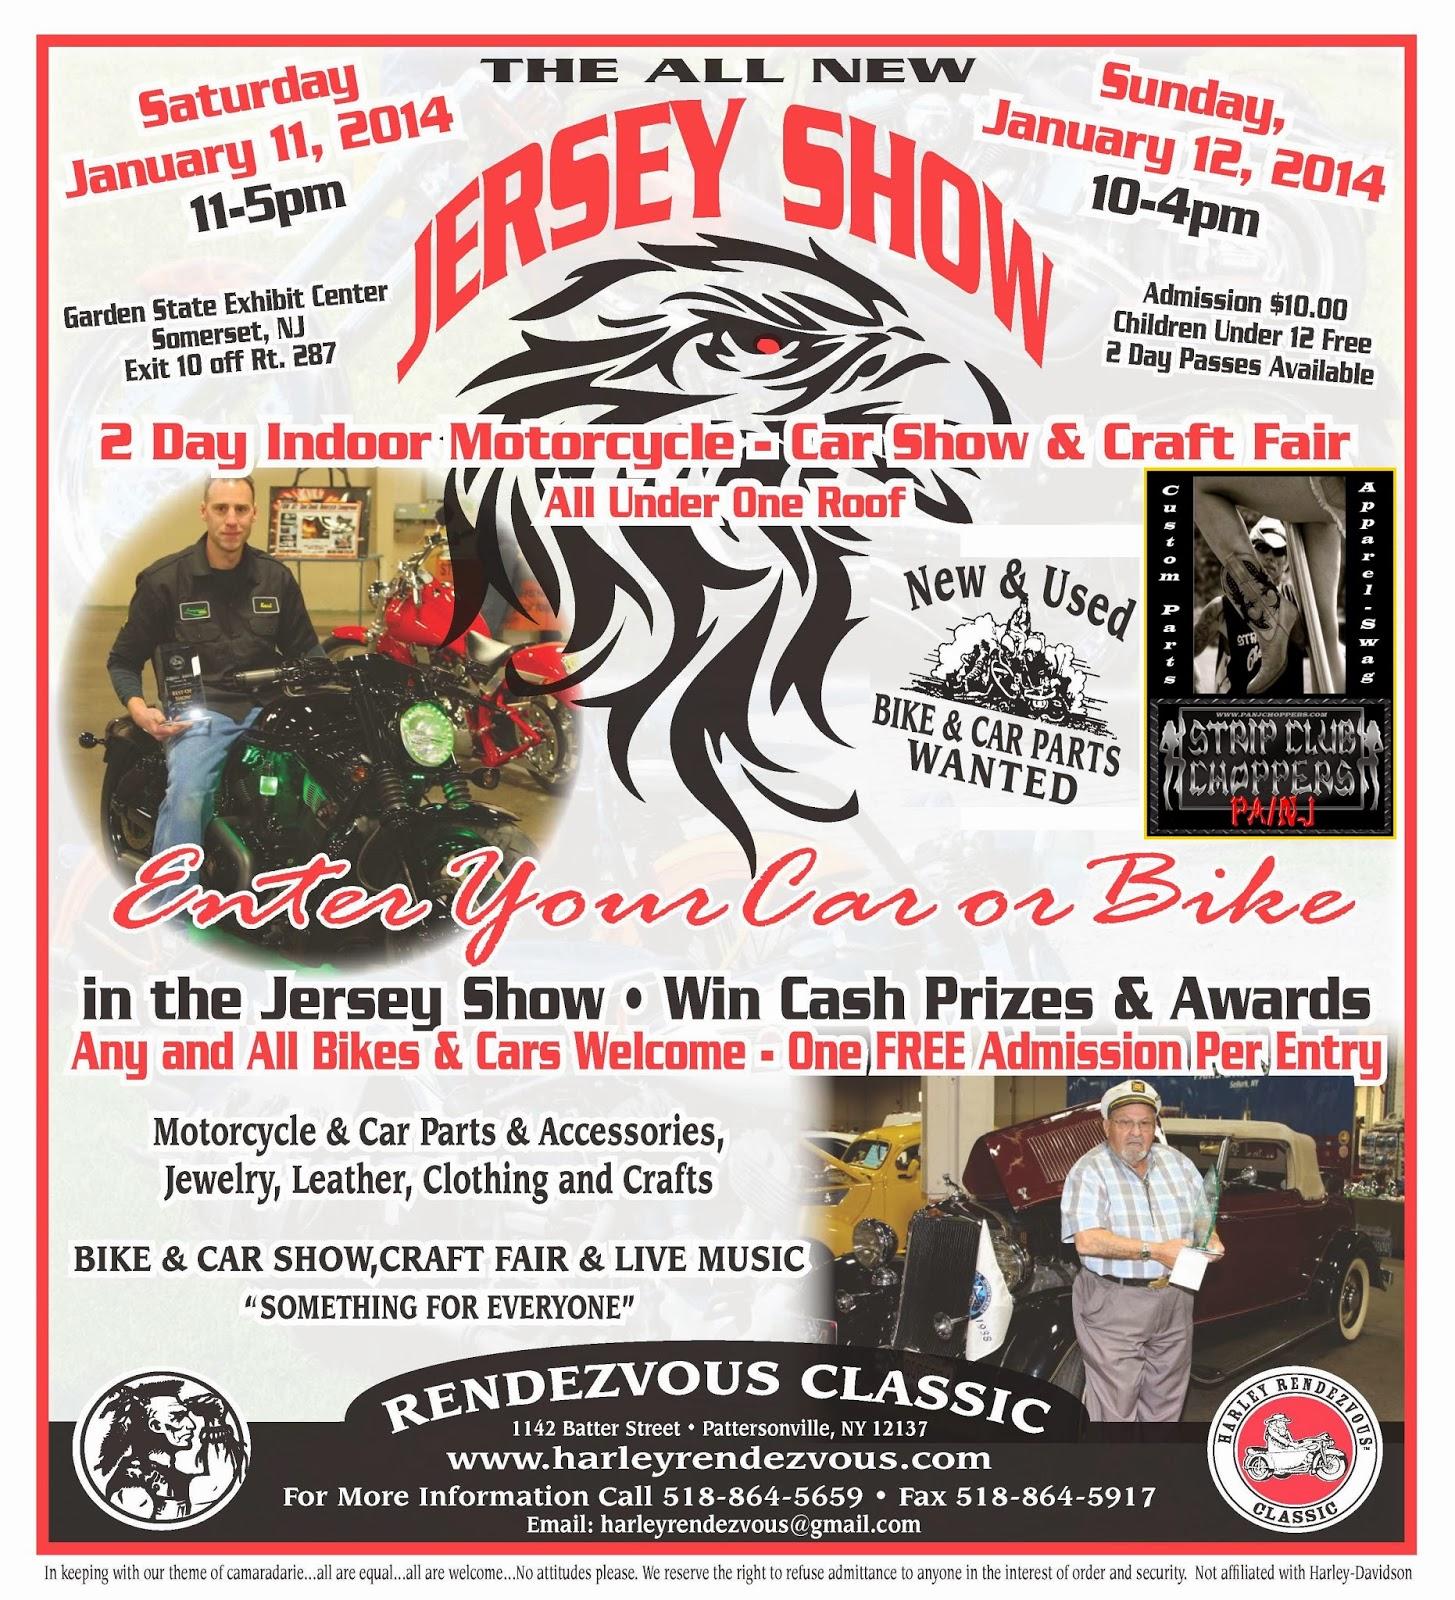 Strip club choppers pa nj harley - Garden state exhibit center somerset nj ...